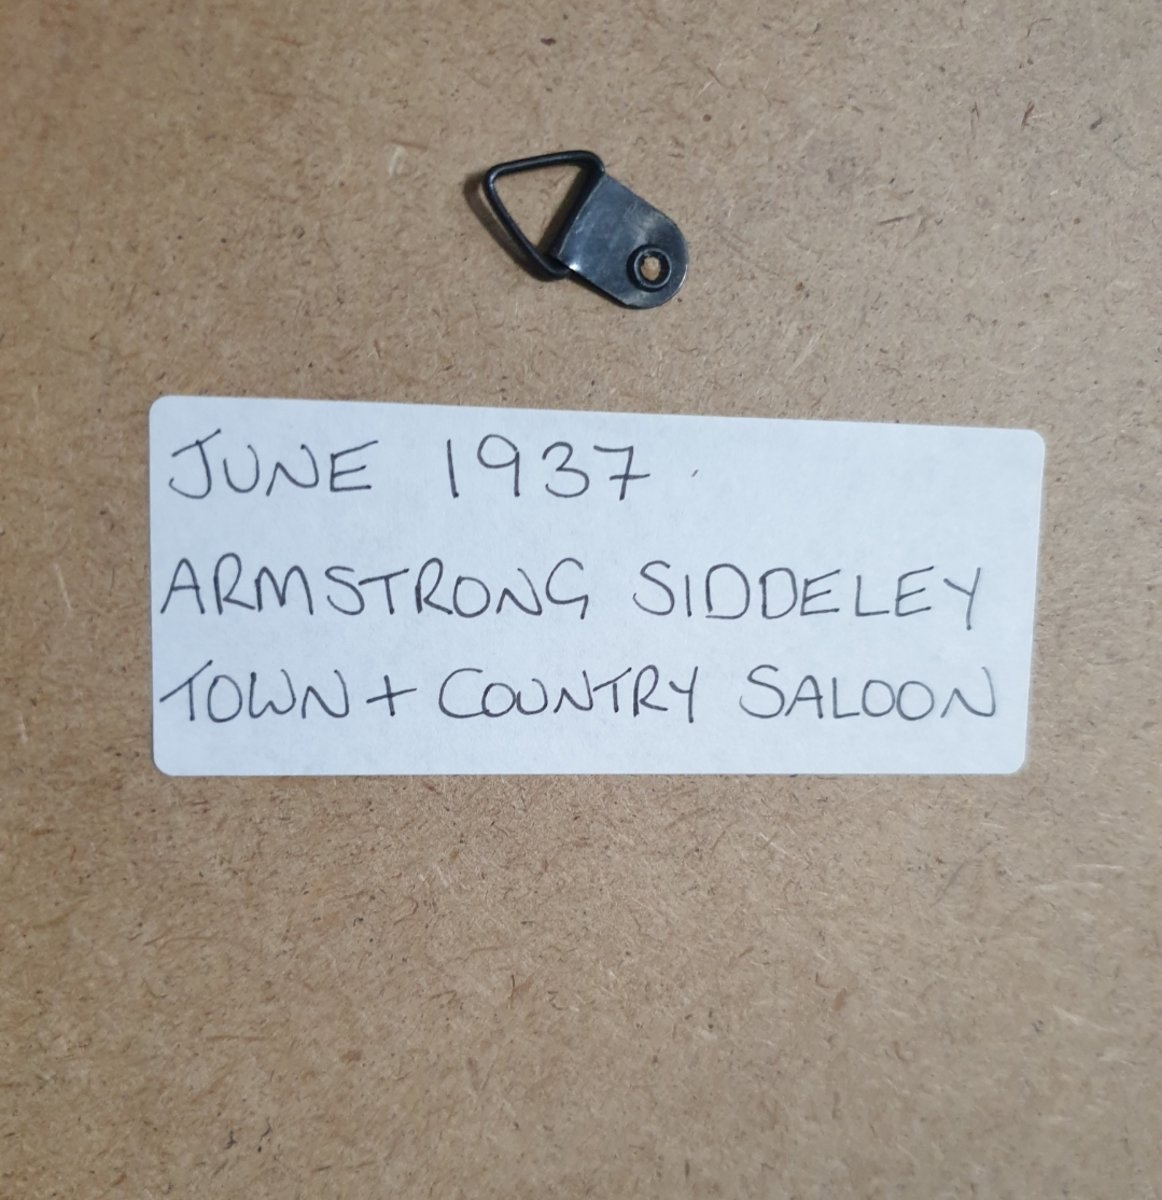 1951 Original 1937 Armstrong-Siddeley Framed Advert For Sale (picture 2 of 3)